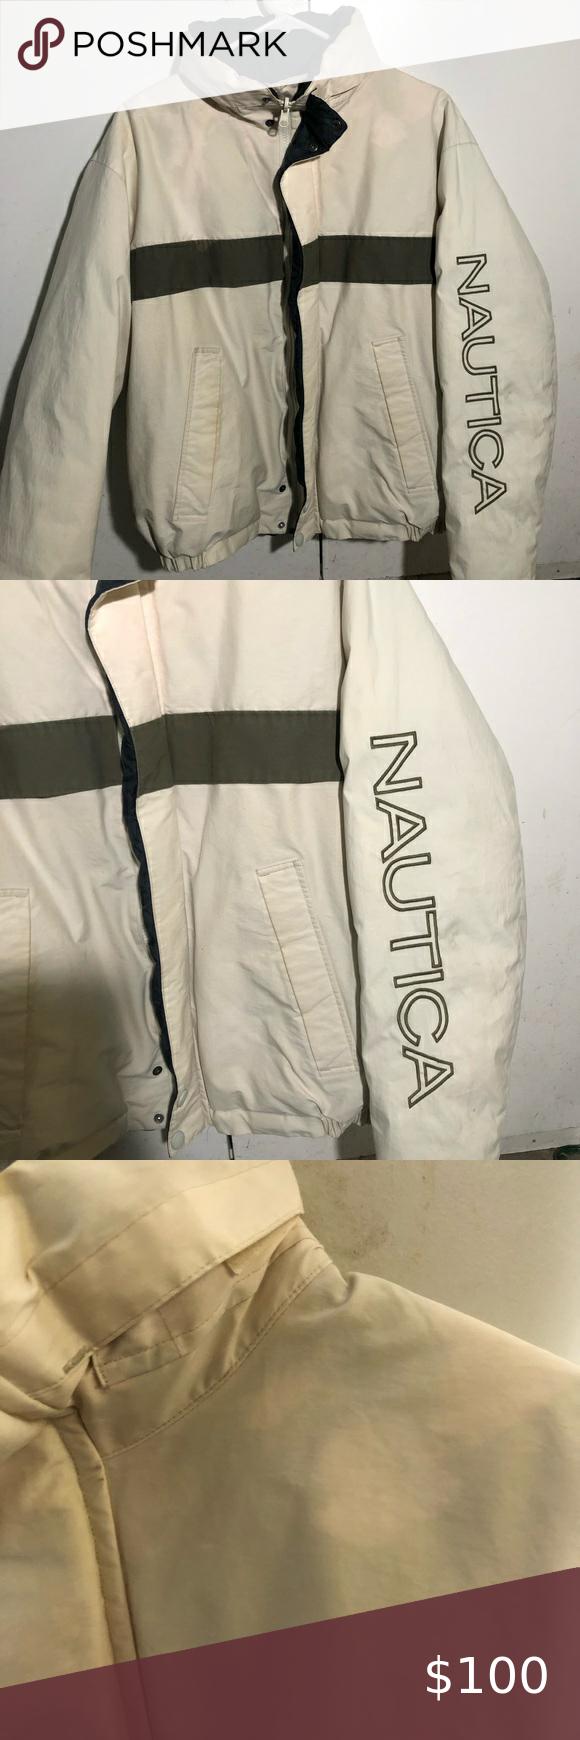 Vintage Reversible Nautica Winter Puffer Jacket Winter Puffer Jackets Jackets Puffer Jackets [ 1740 x 580 Pixel ]